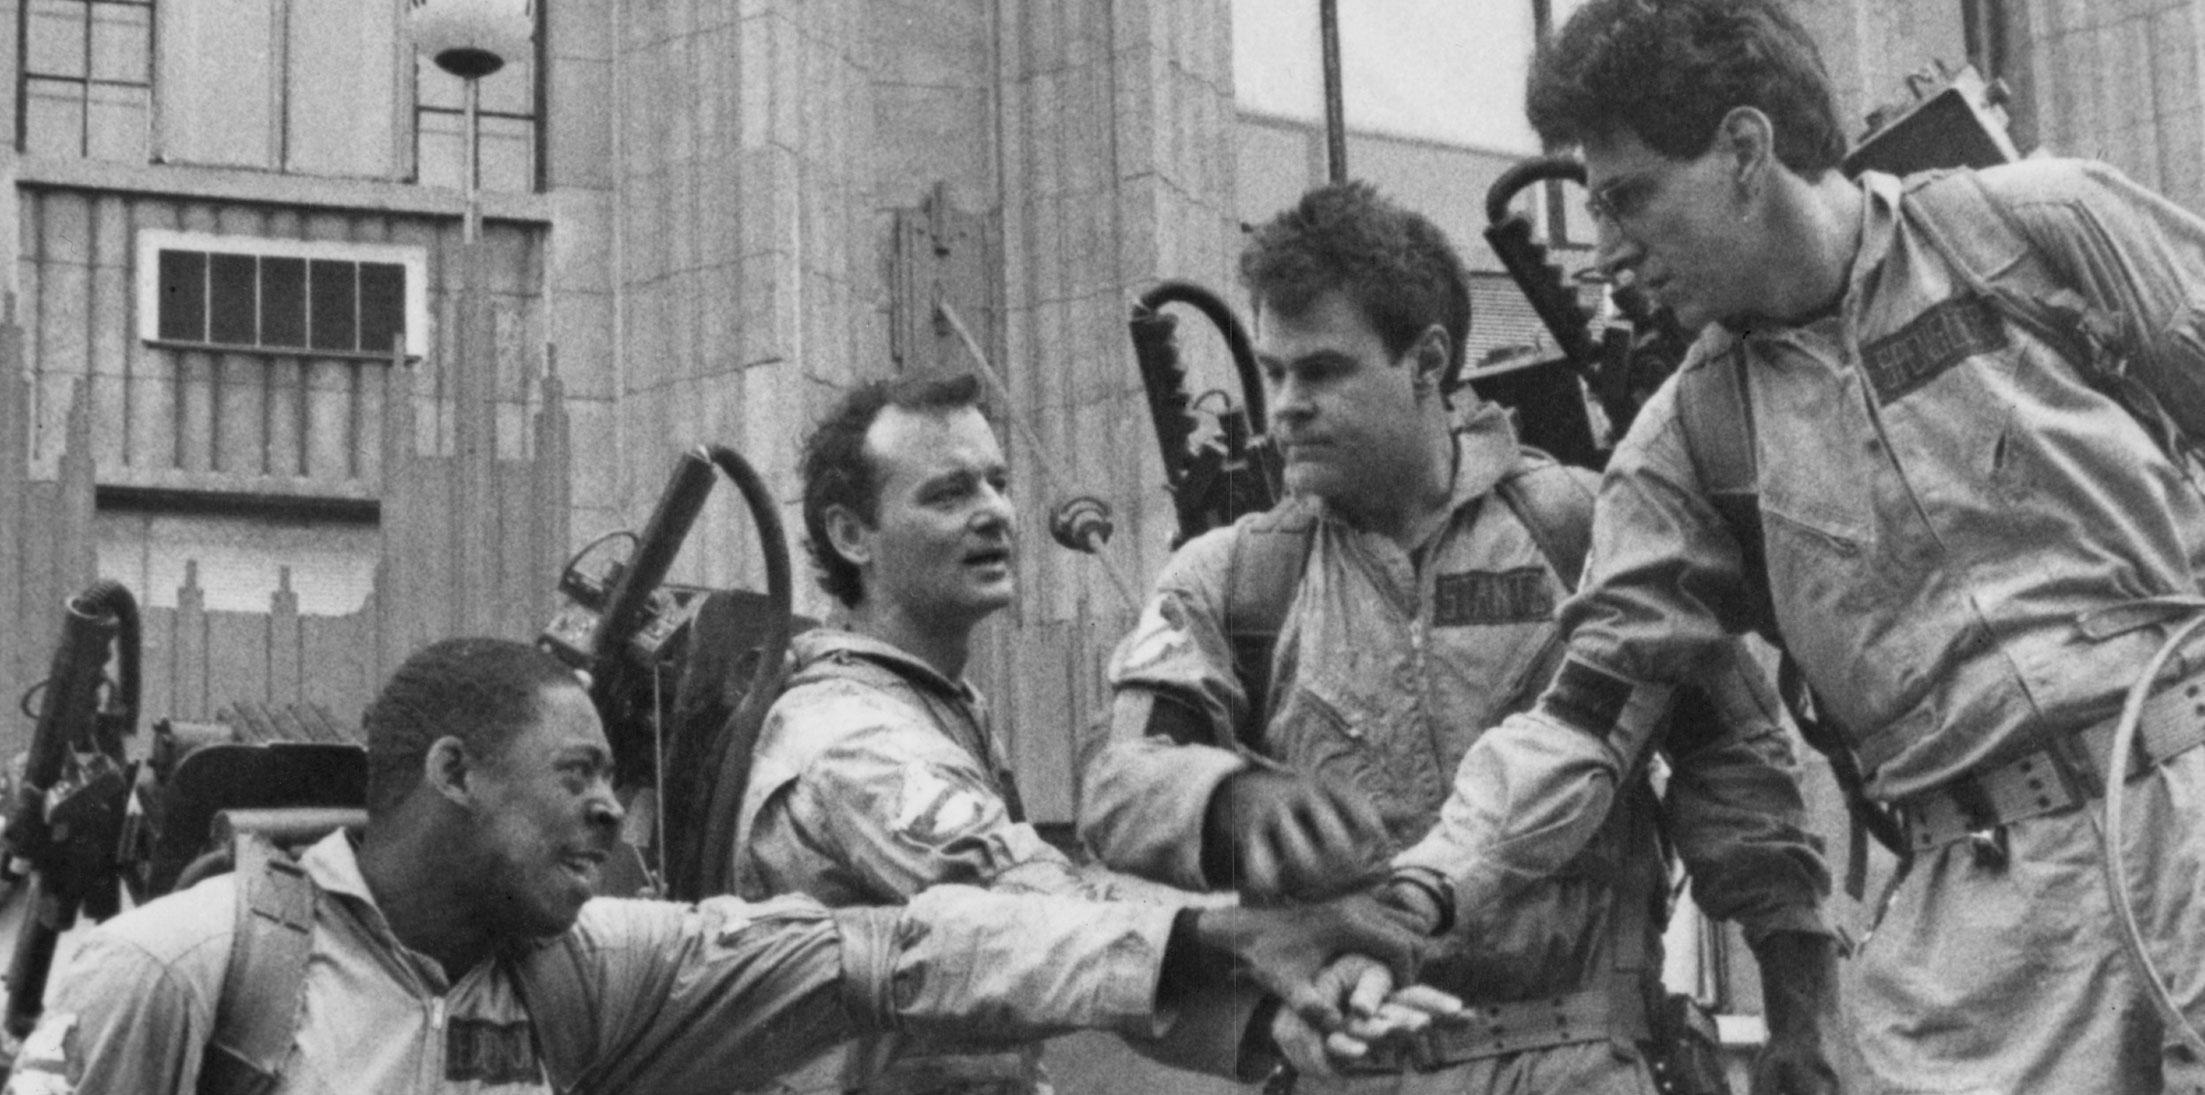 Dan Aykroyd Knew 'Ghostbusters' Director's Reputation